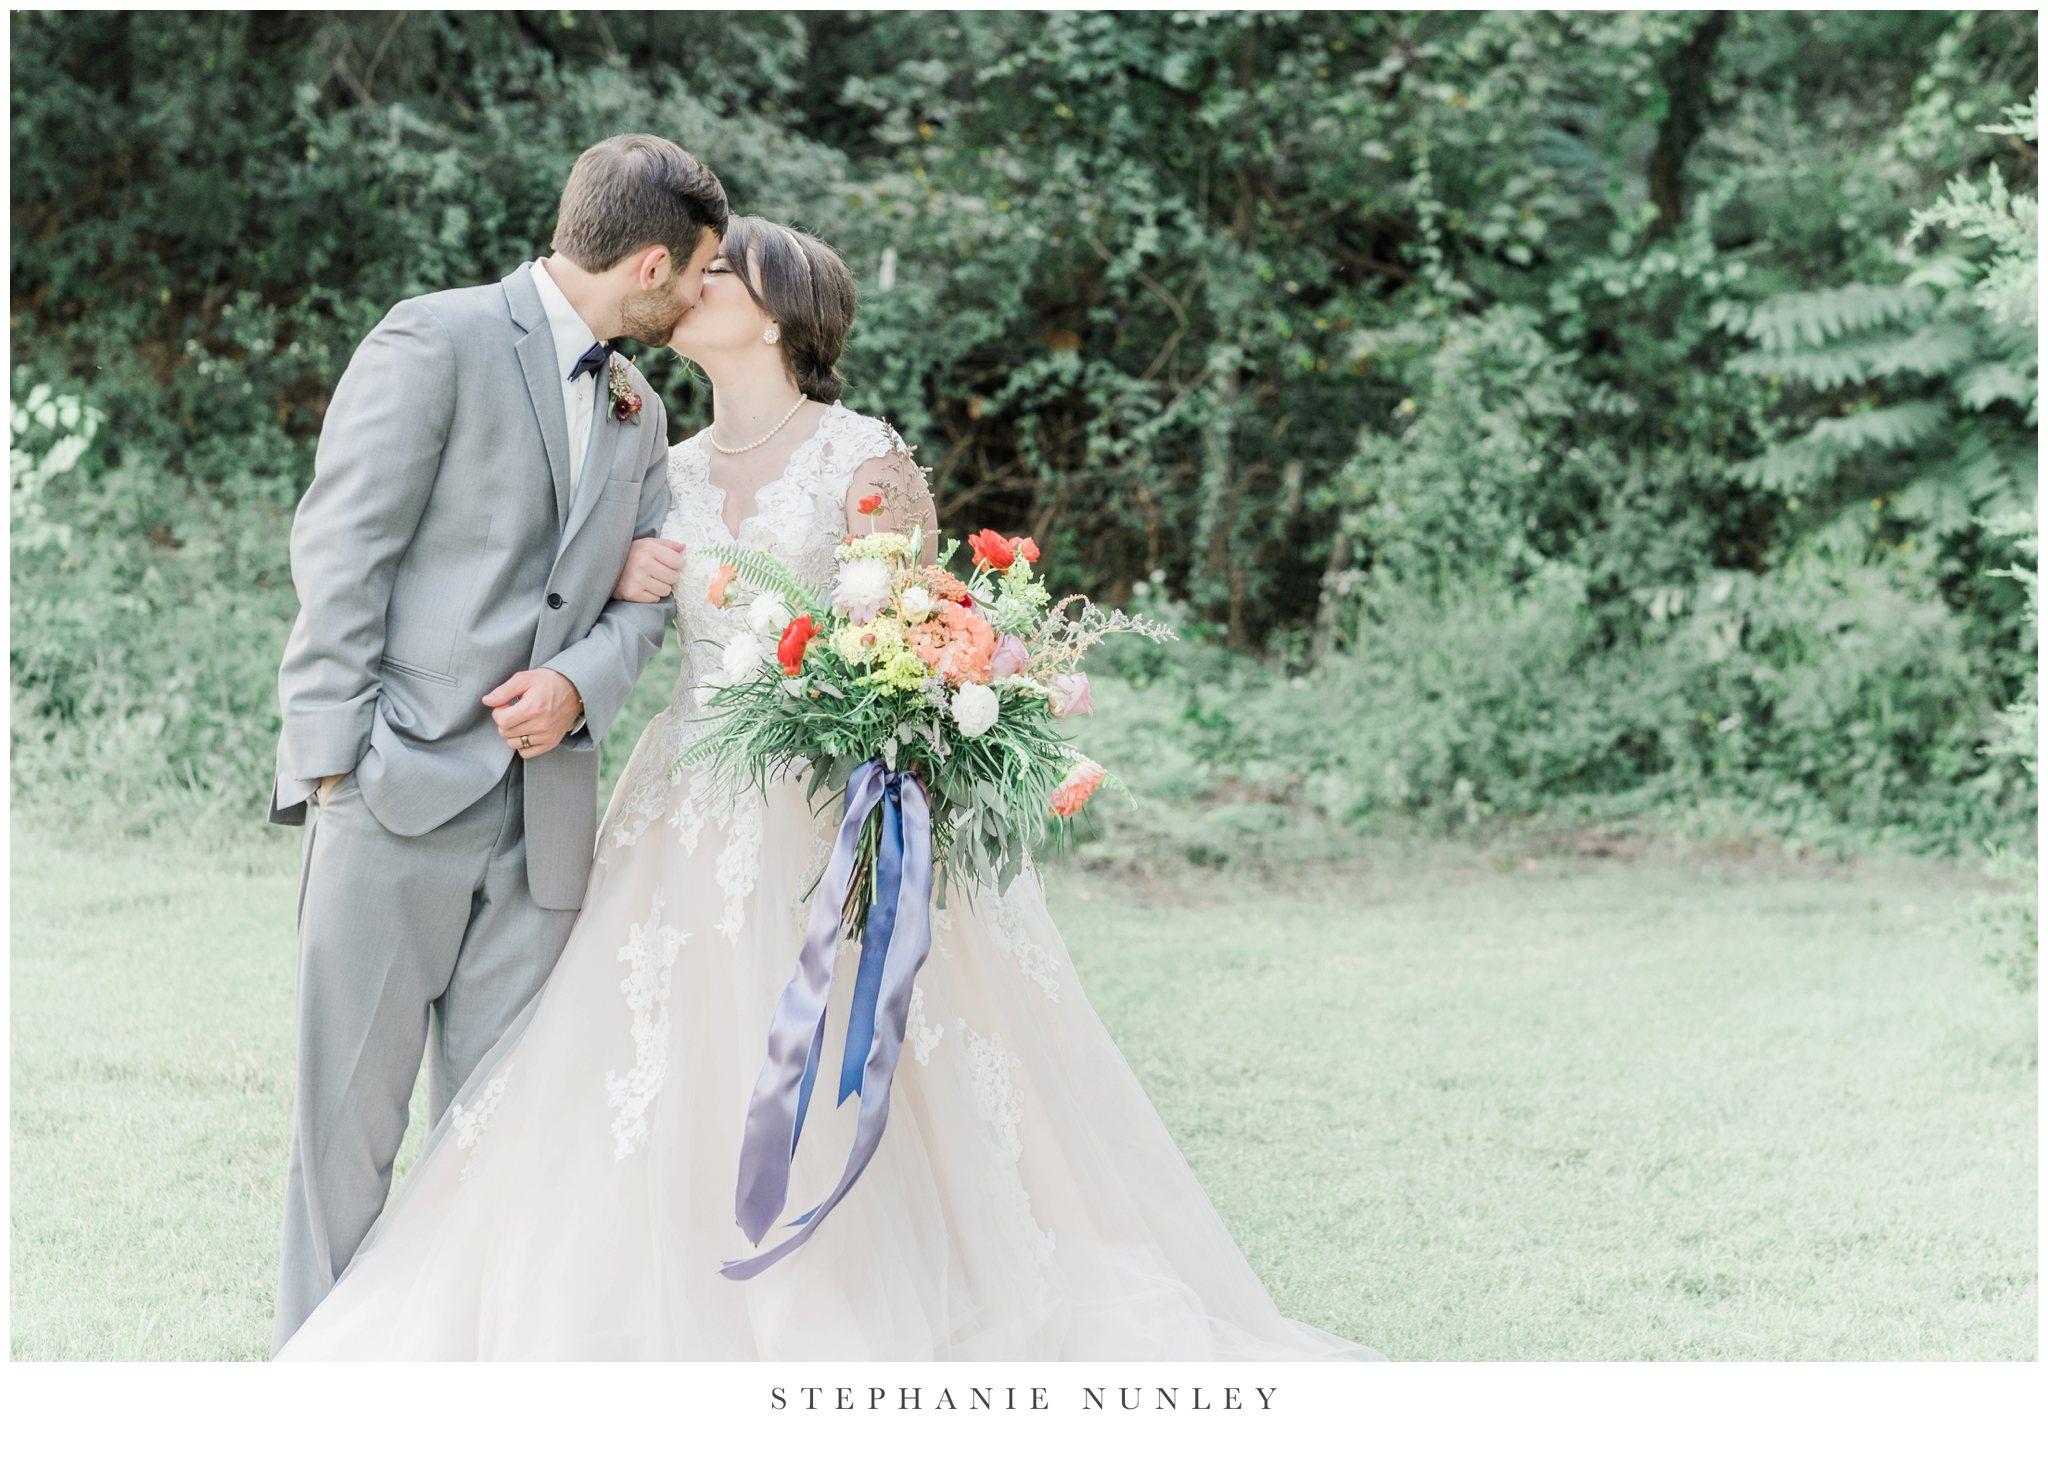 arkansas-wedding-with-lush-wildflower-bouquet-0132.jpg